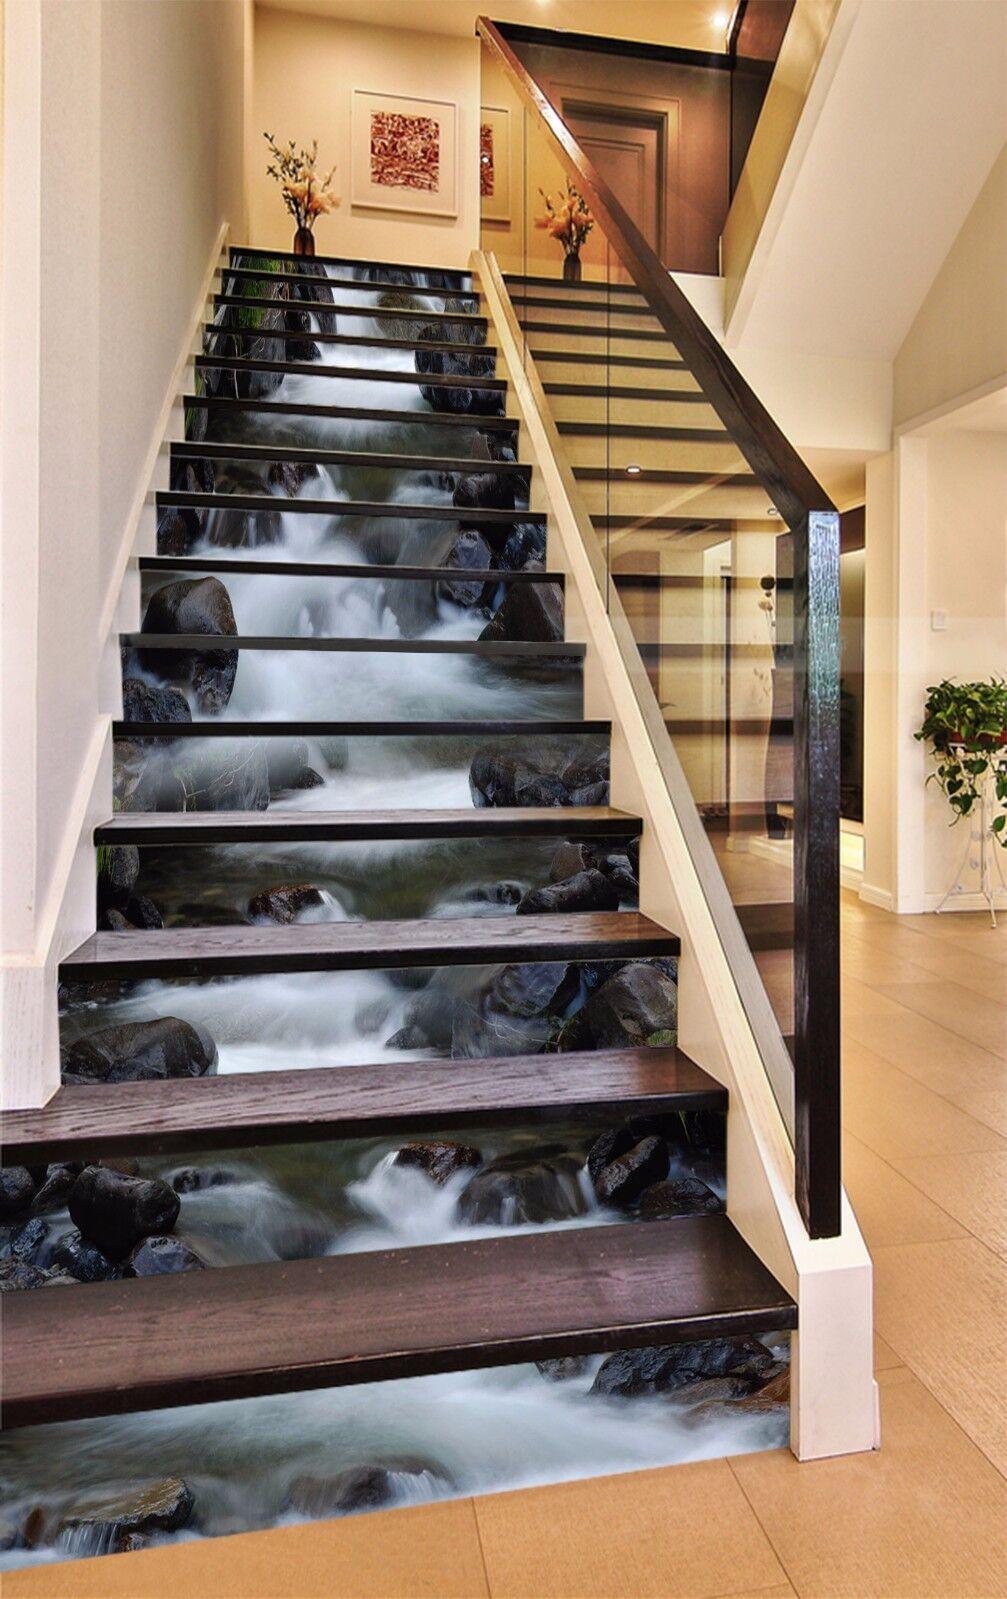 3D Stone Brook 5011 Stair Risers Decoration Photo Mural Vinyl Decal Wallpaper AU